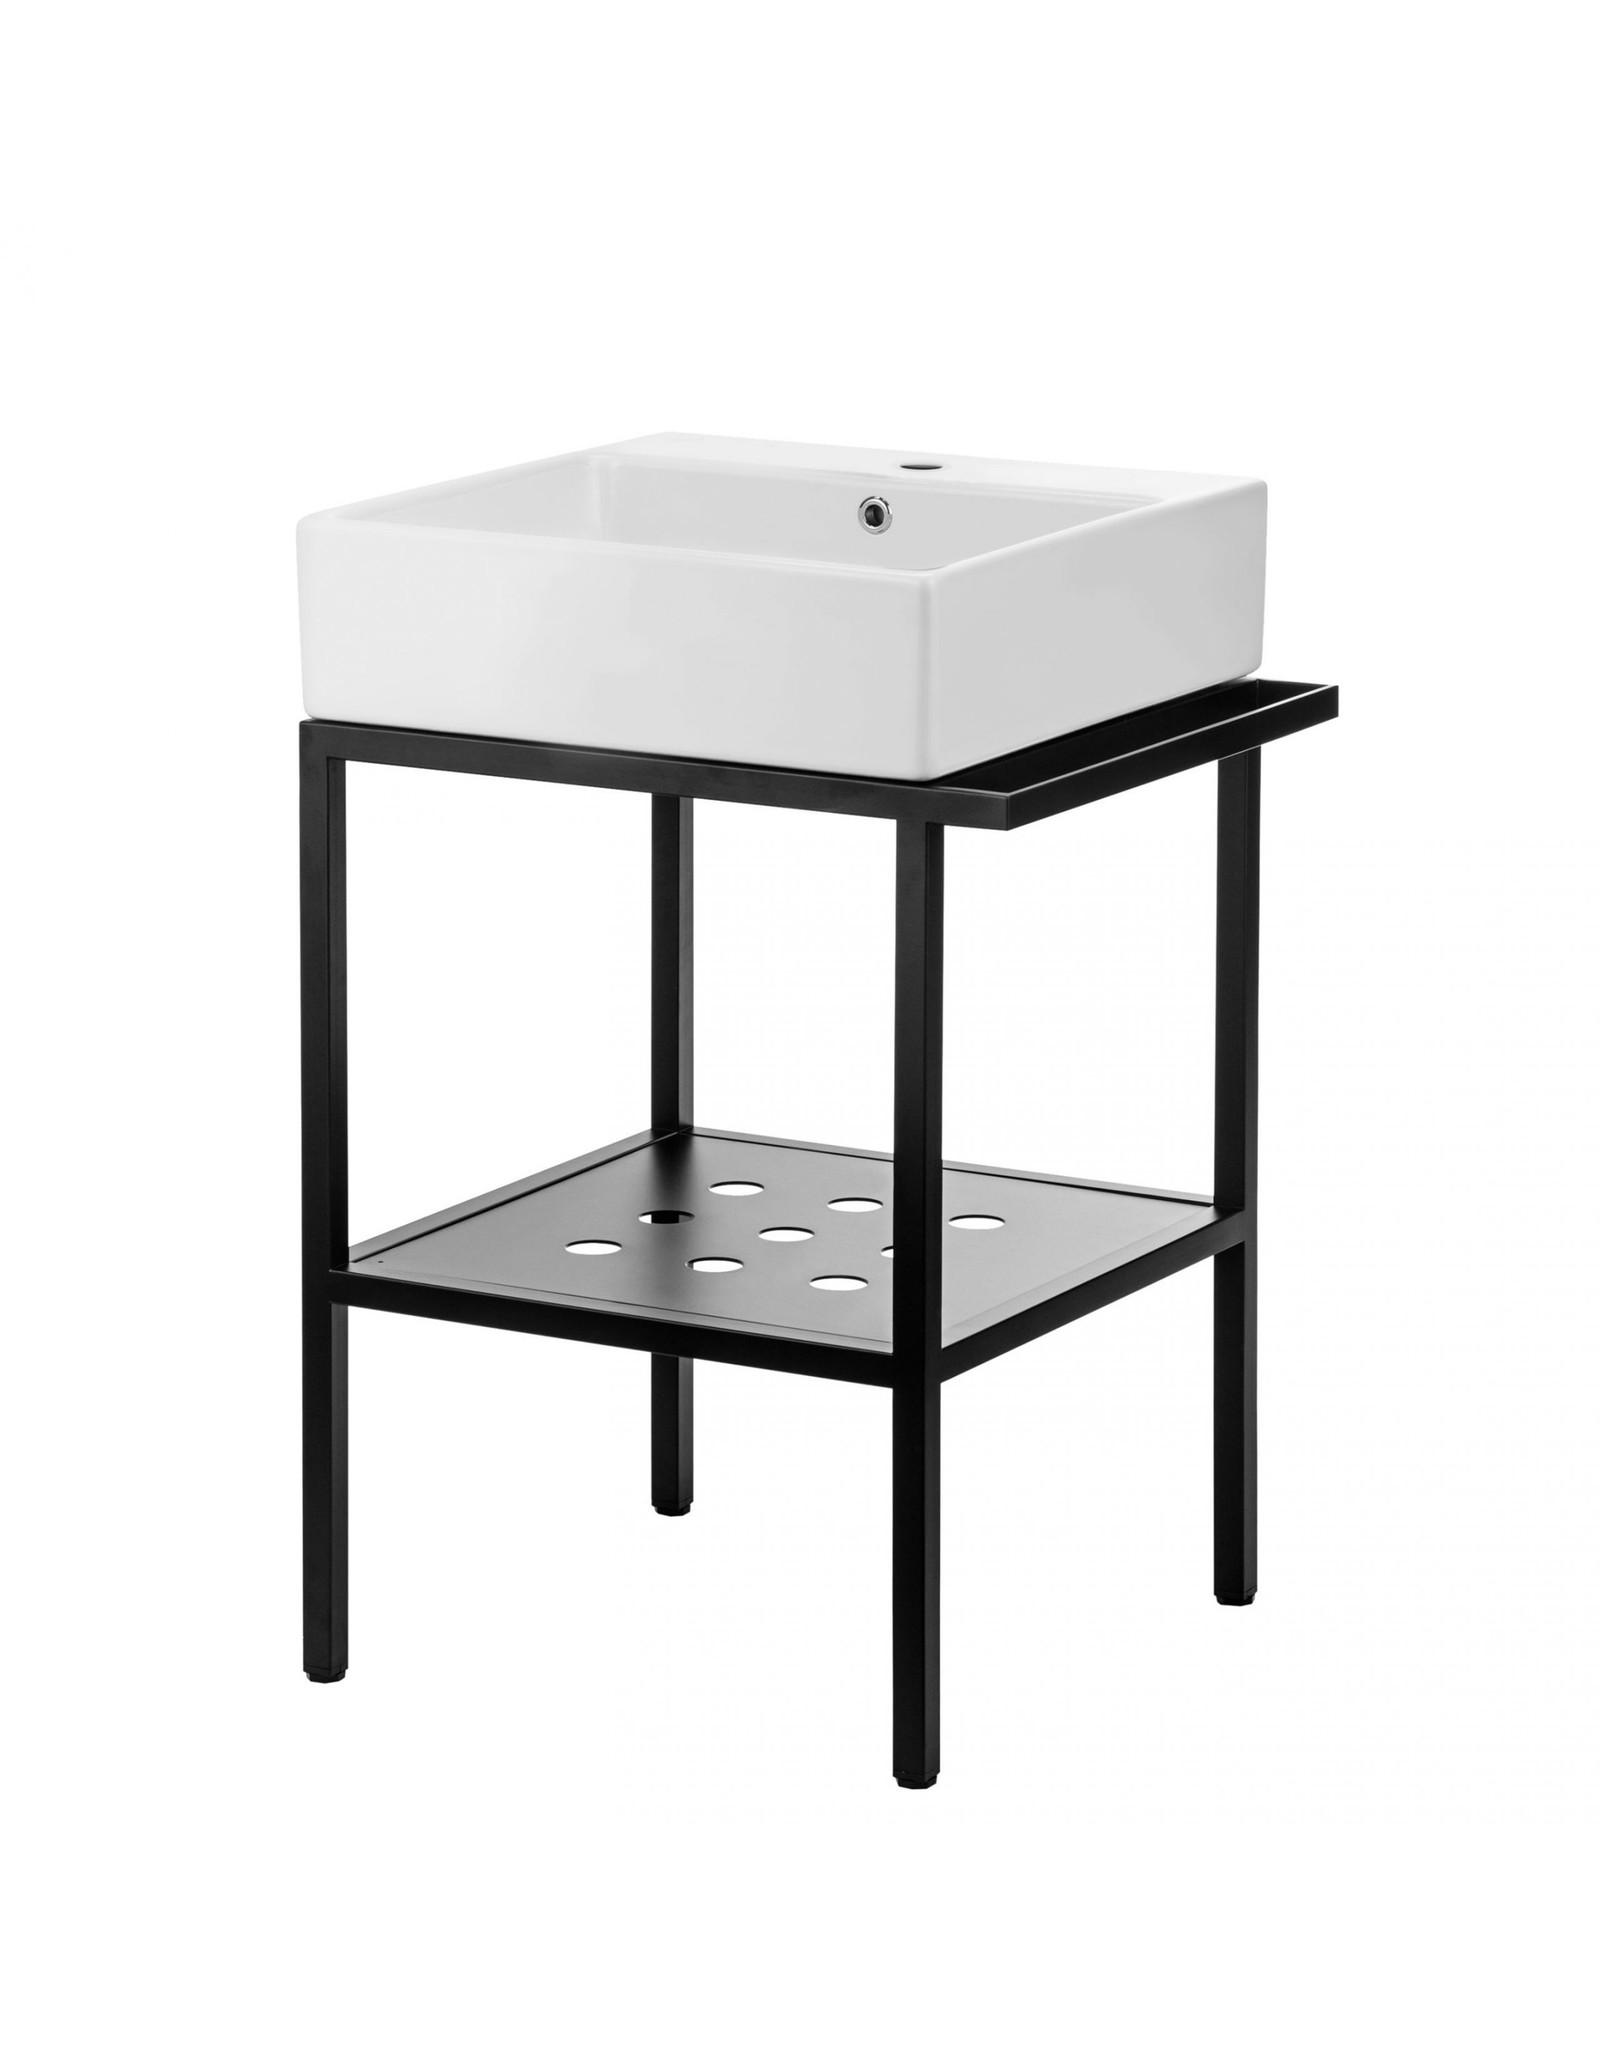 fabriecio Design bad meubel  50 x 40 cm